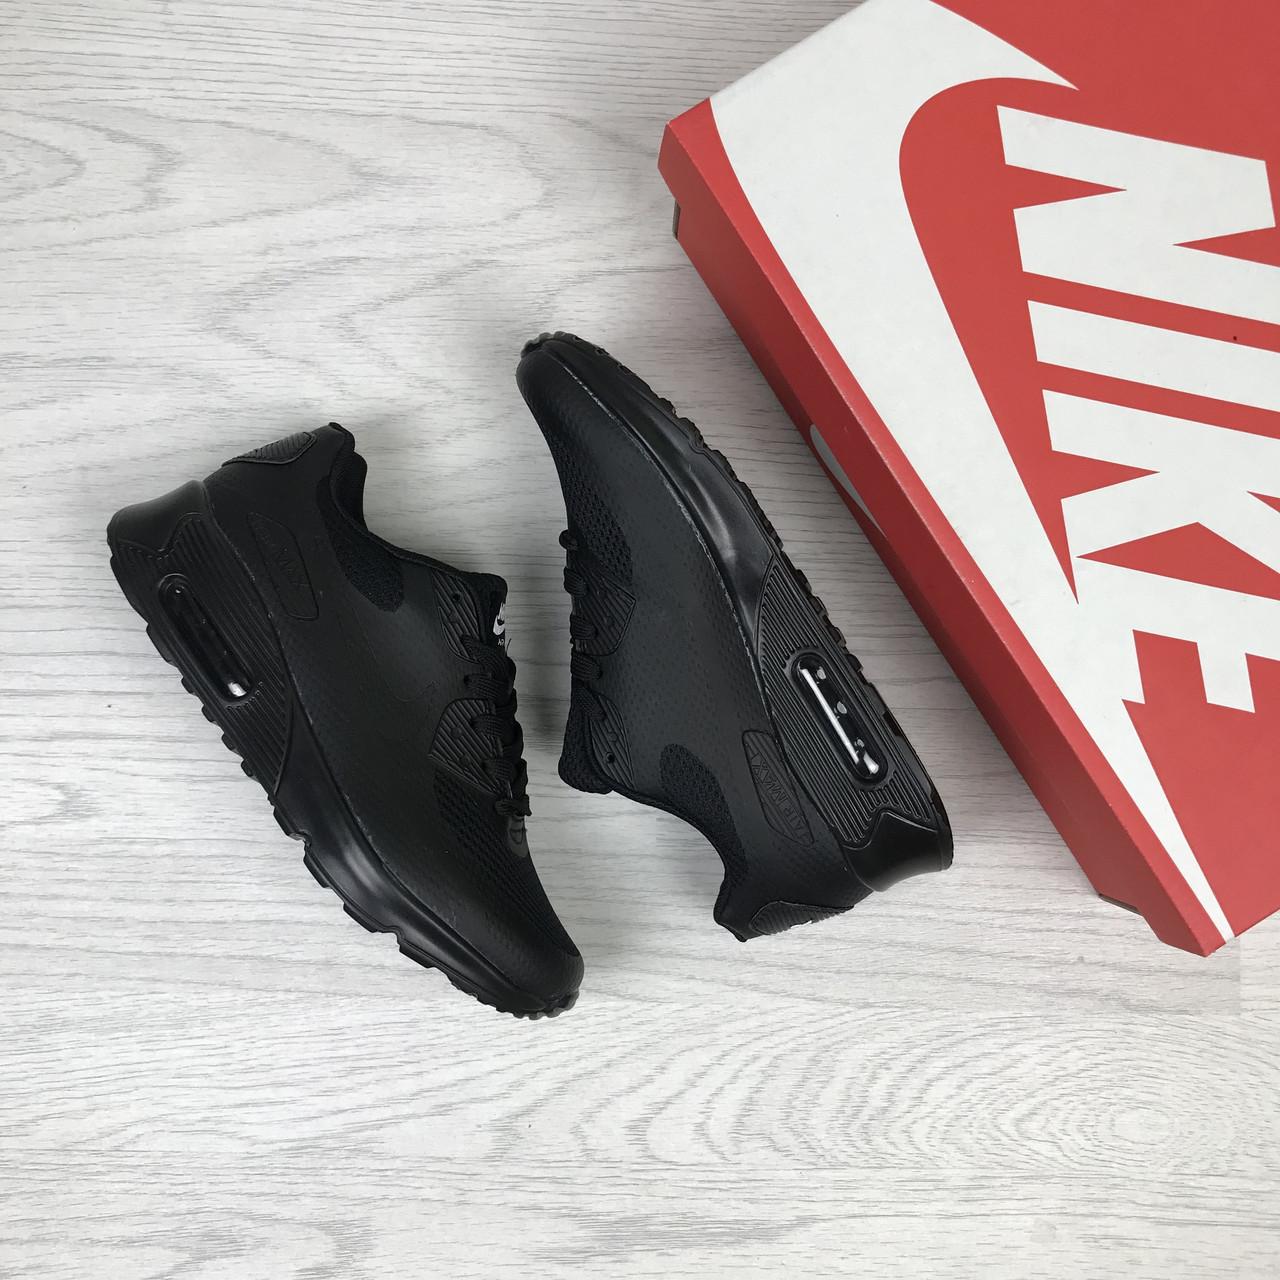 045fe8f9 Женские кроссовки Nike Air Max Hyperfuse черные (Реплика ААА+) ...